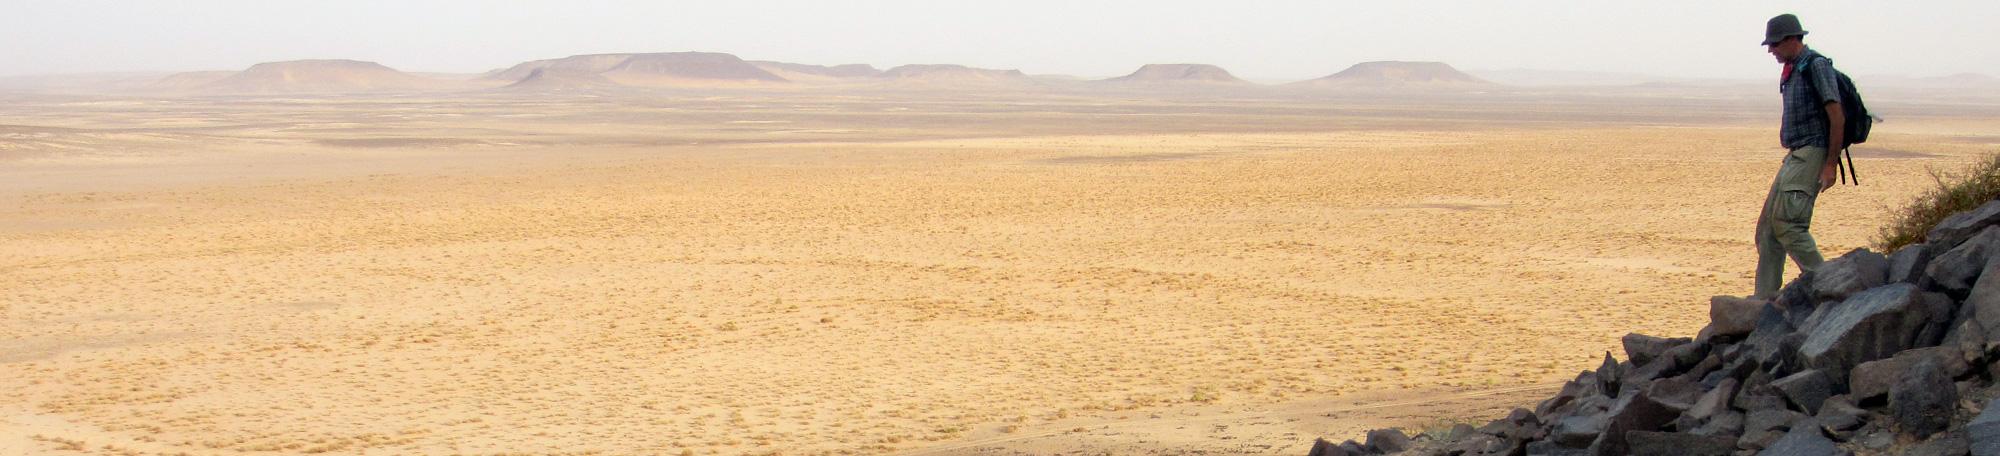 Rowan in Jordan